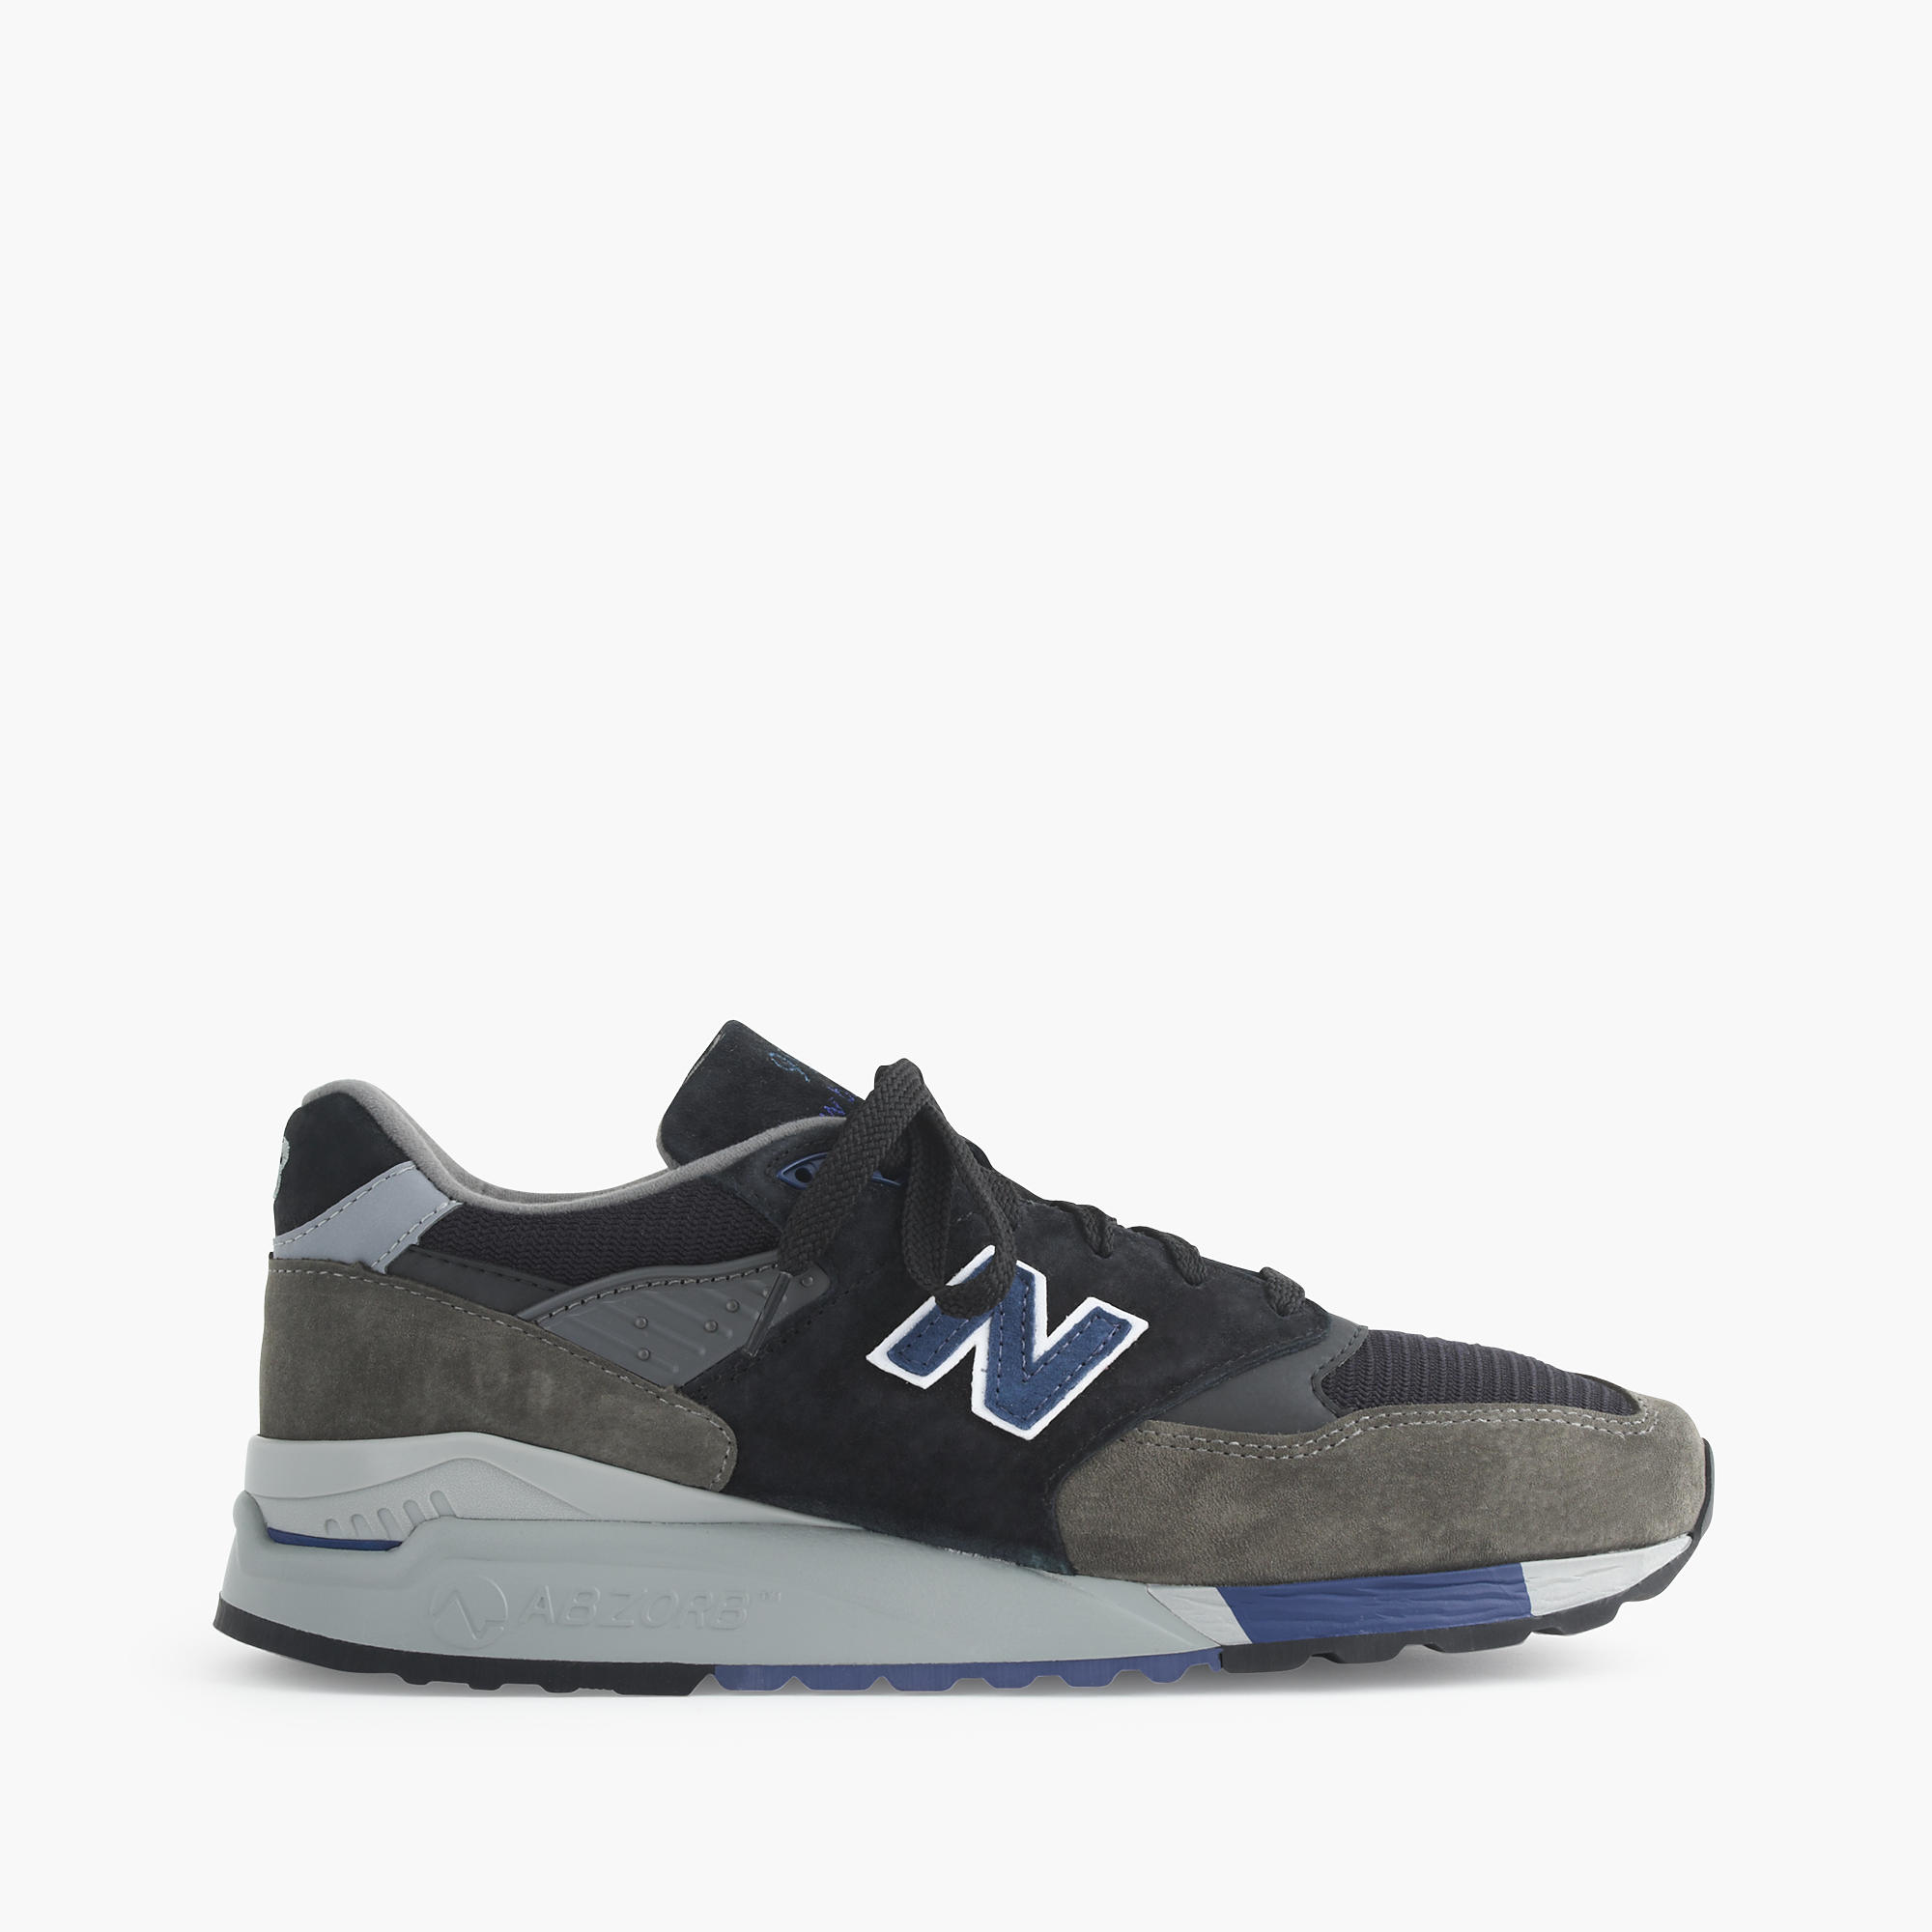 Custom New Balance Mens Shoes